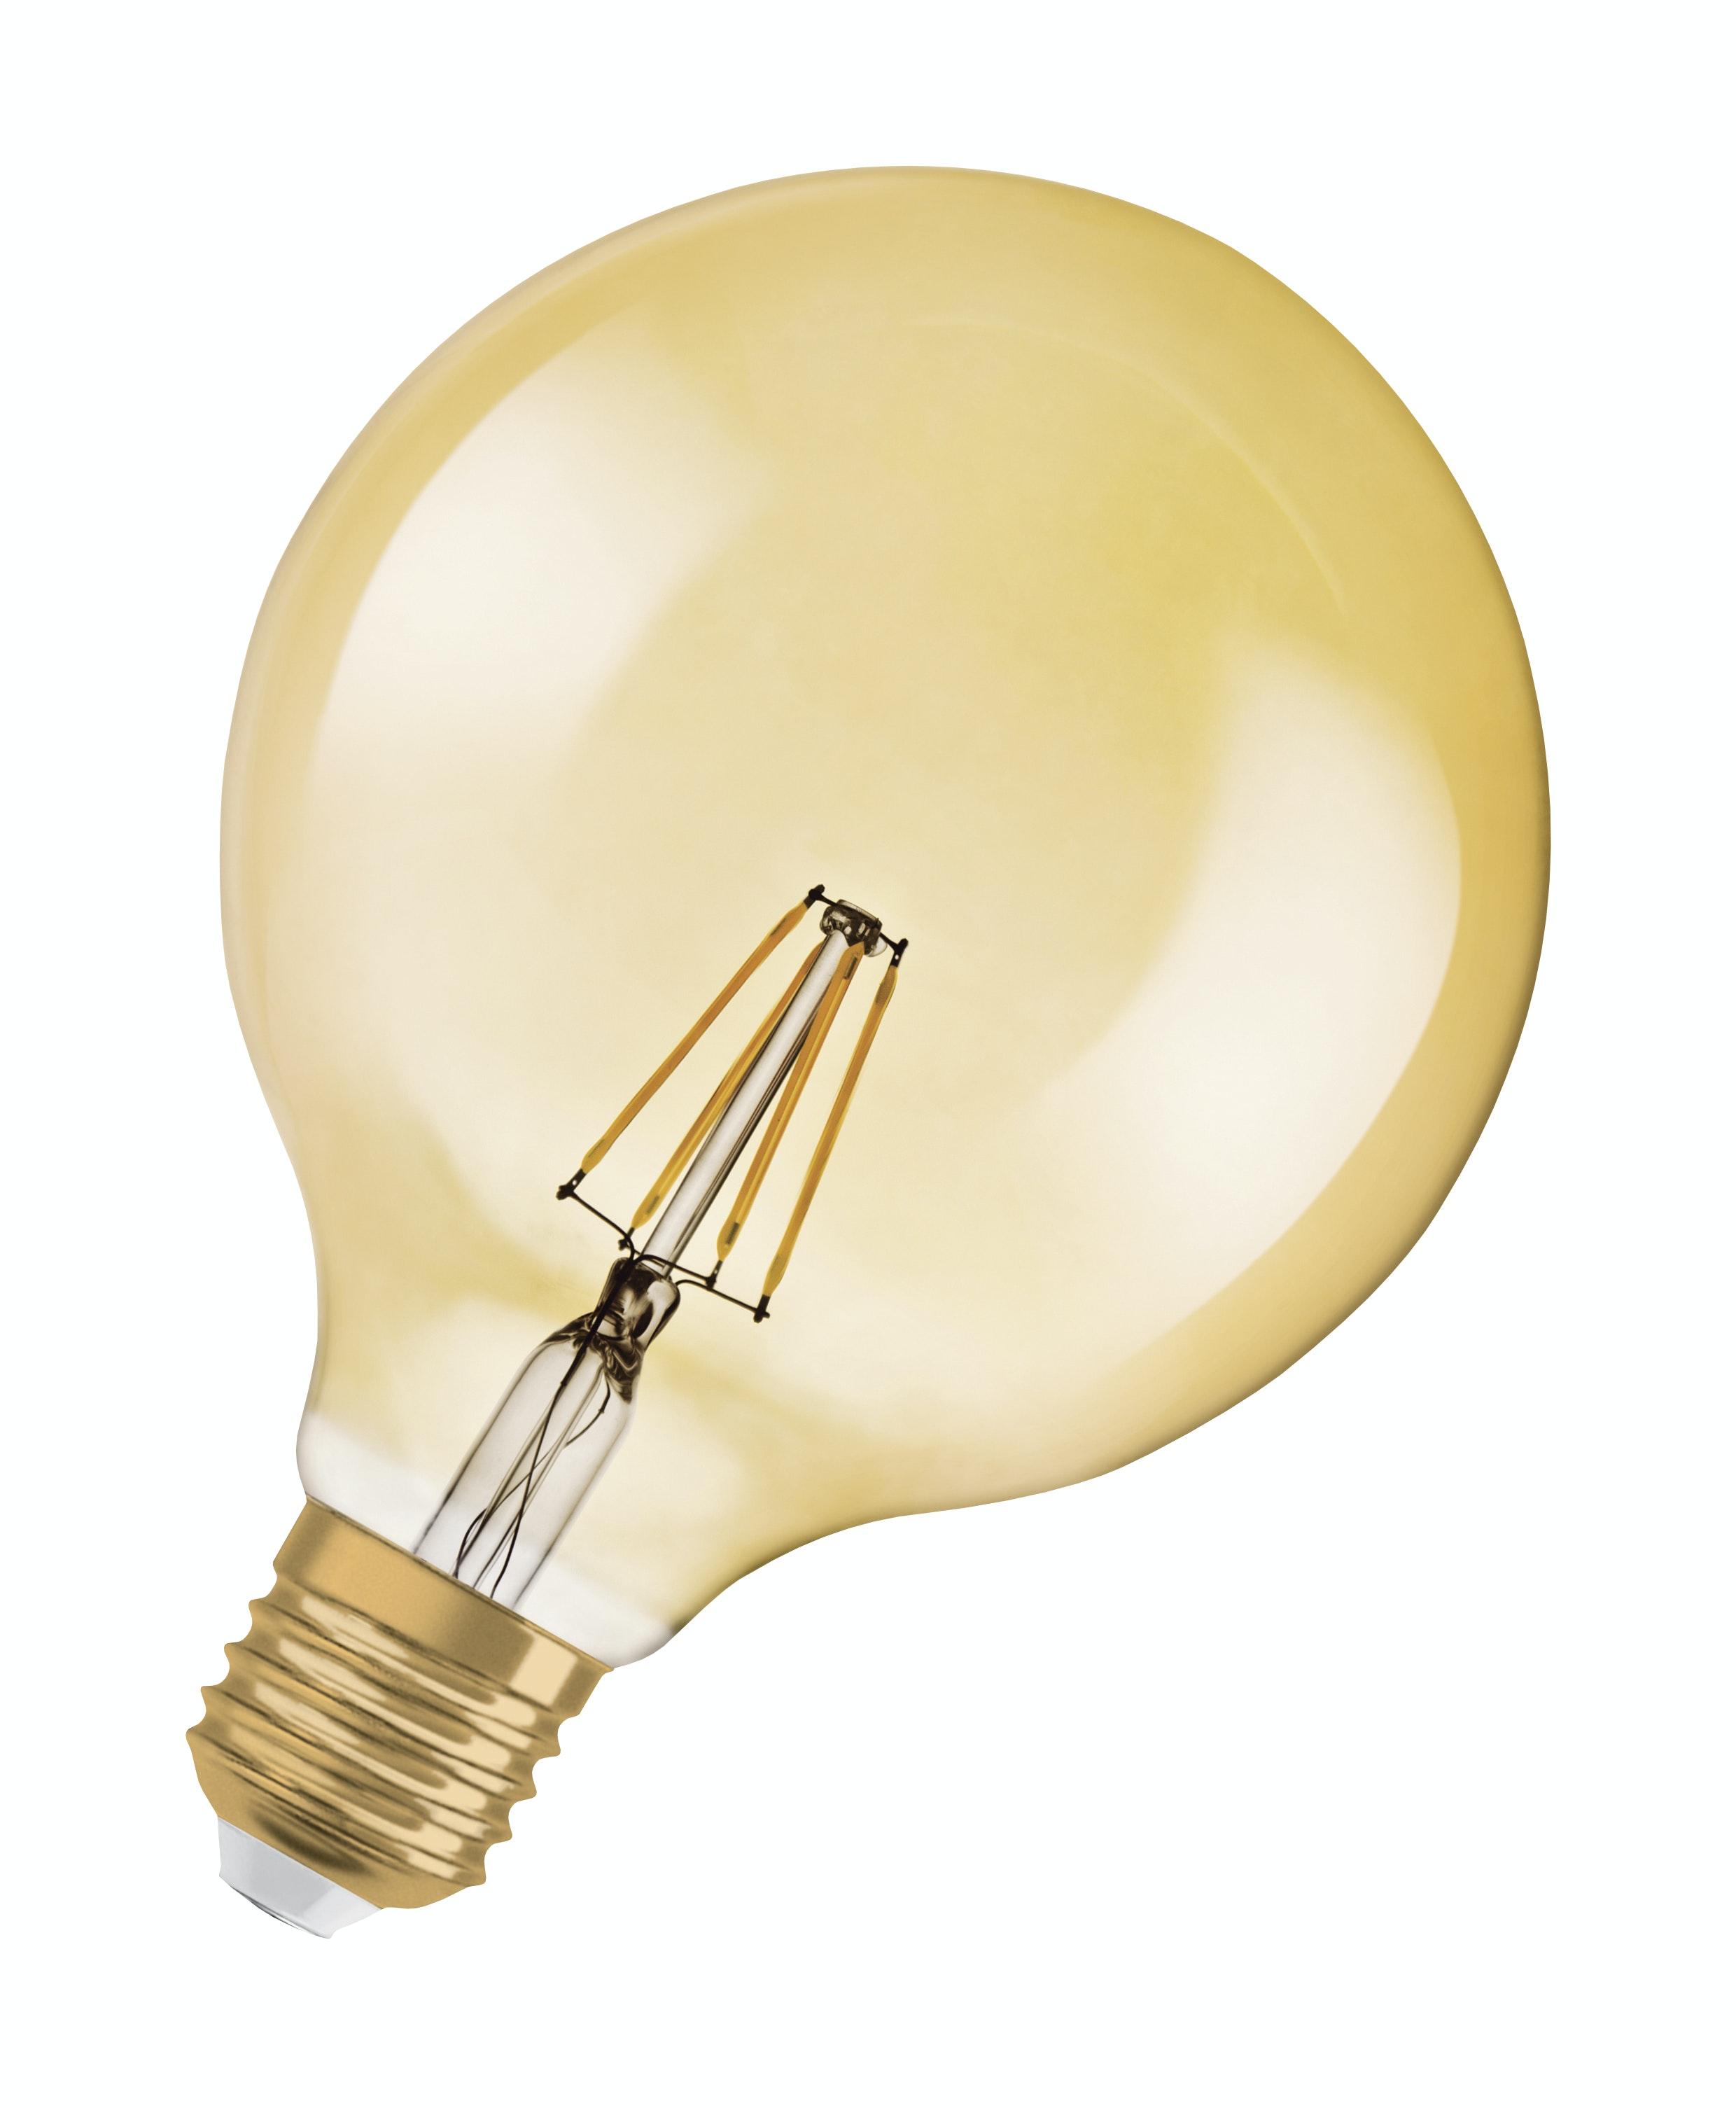 Led-Lampa Osram Vintage 1906 E27 Globe Filament 824 7W Ej Dimbar Gold